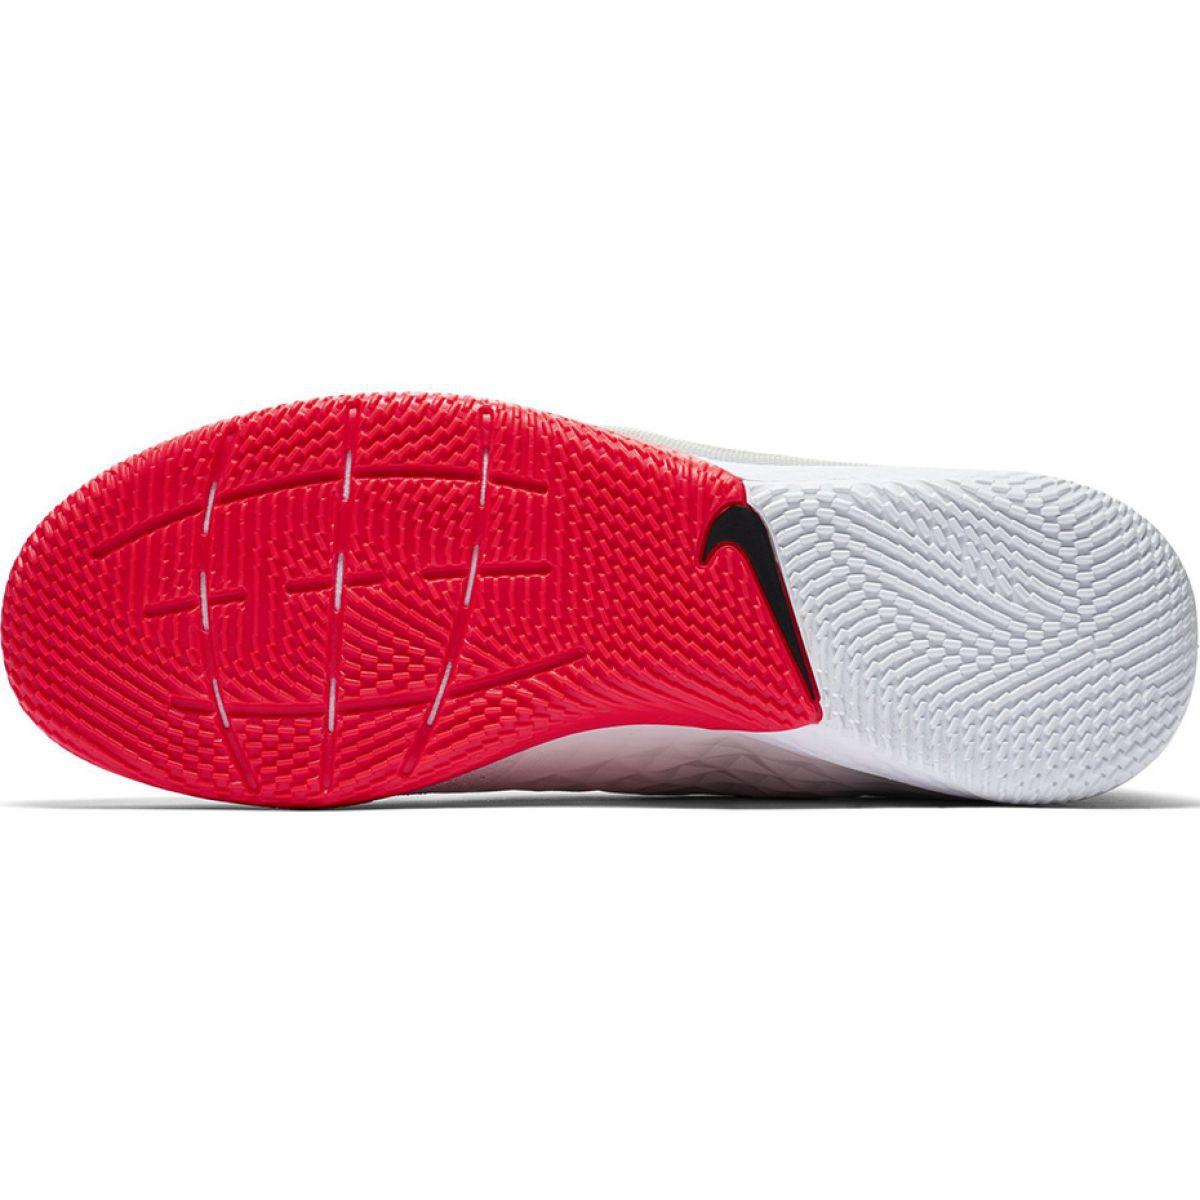 Chuteiras de futebol Nike Tiempo React Legend 8 Pro M Ic AT6134 061 bege bege creme, vermelho